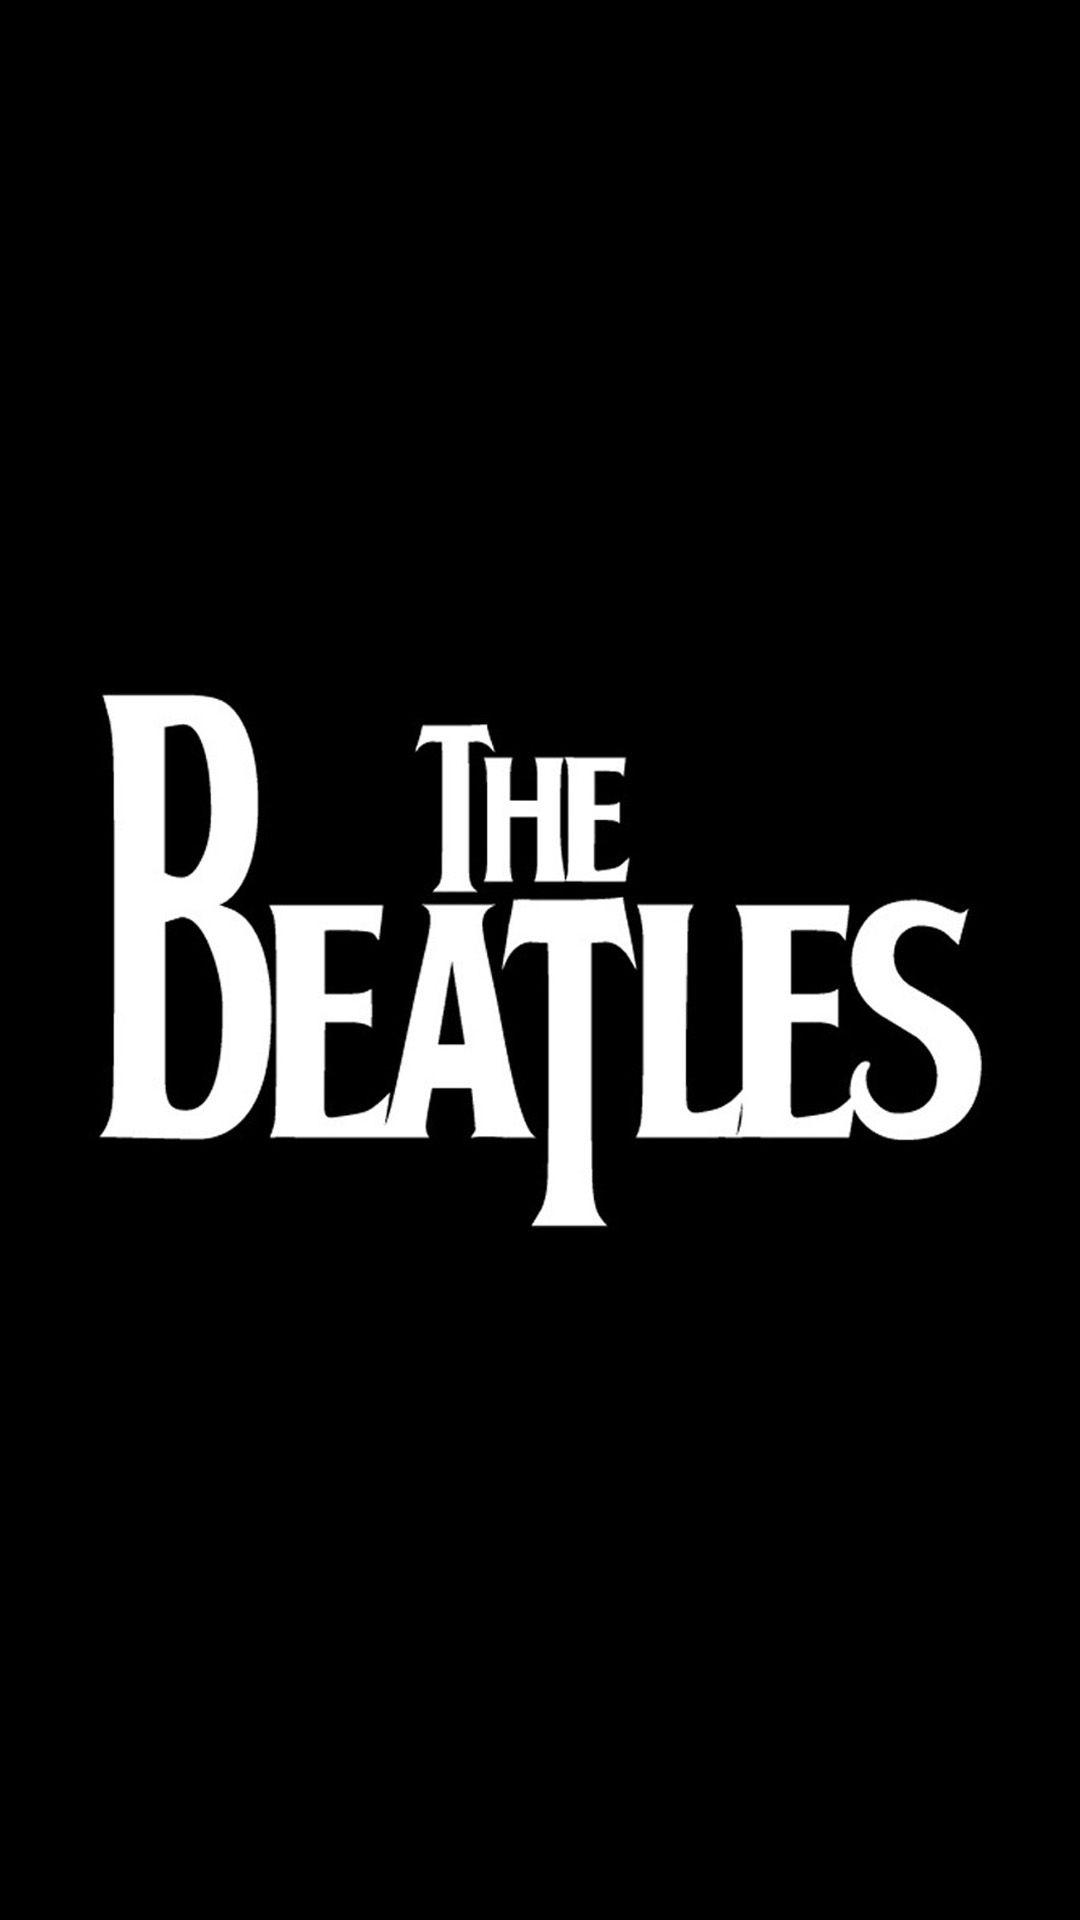 The Beatles Wallpaper Free Desktop Hd Ipad Iphone Wallpapers Beatles Fotografi Tempo Dulu Musisi